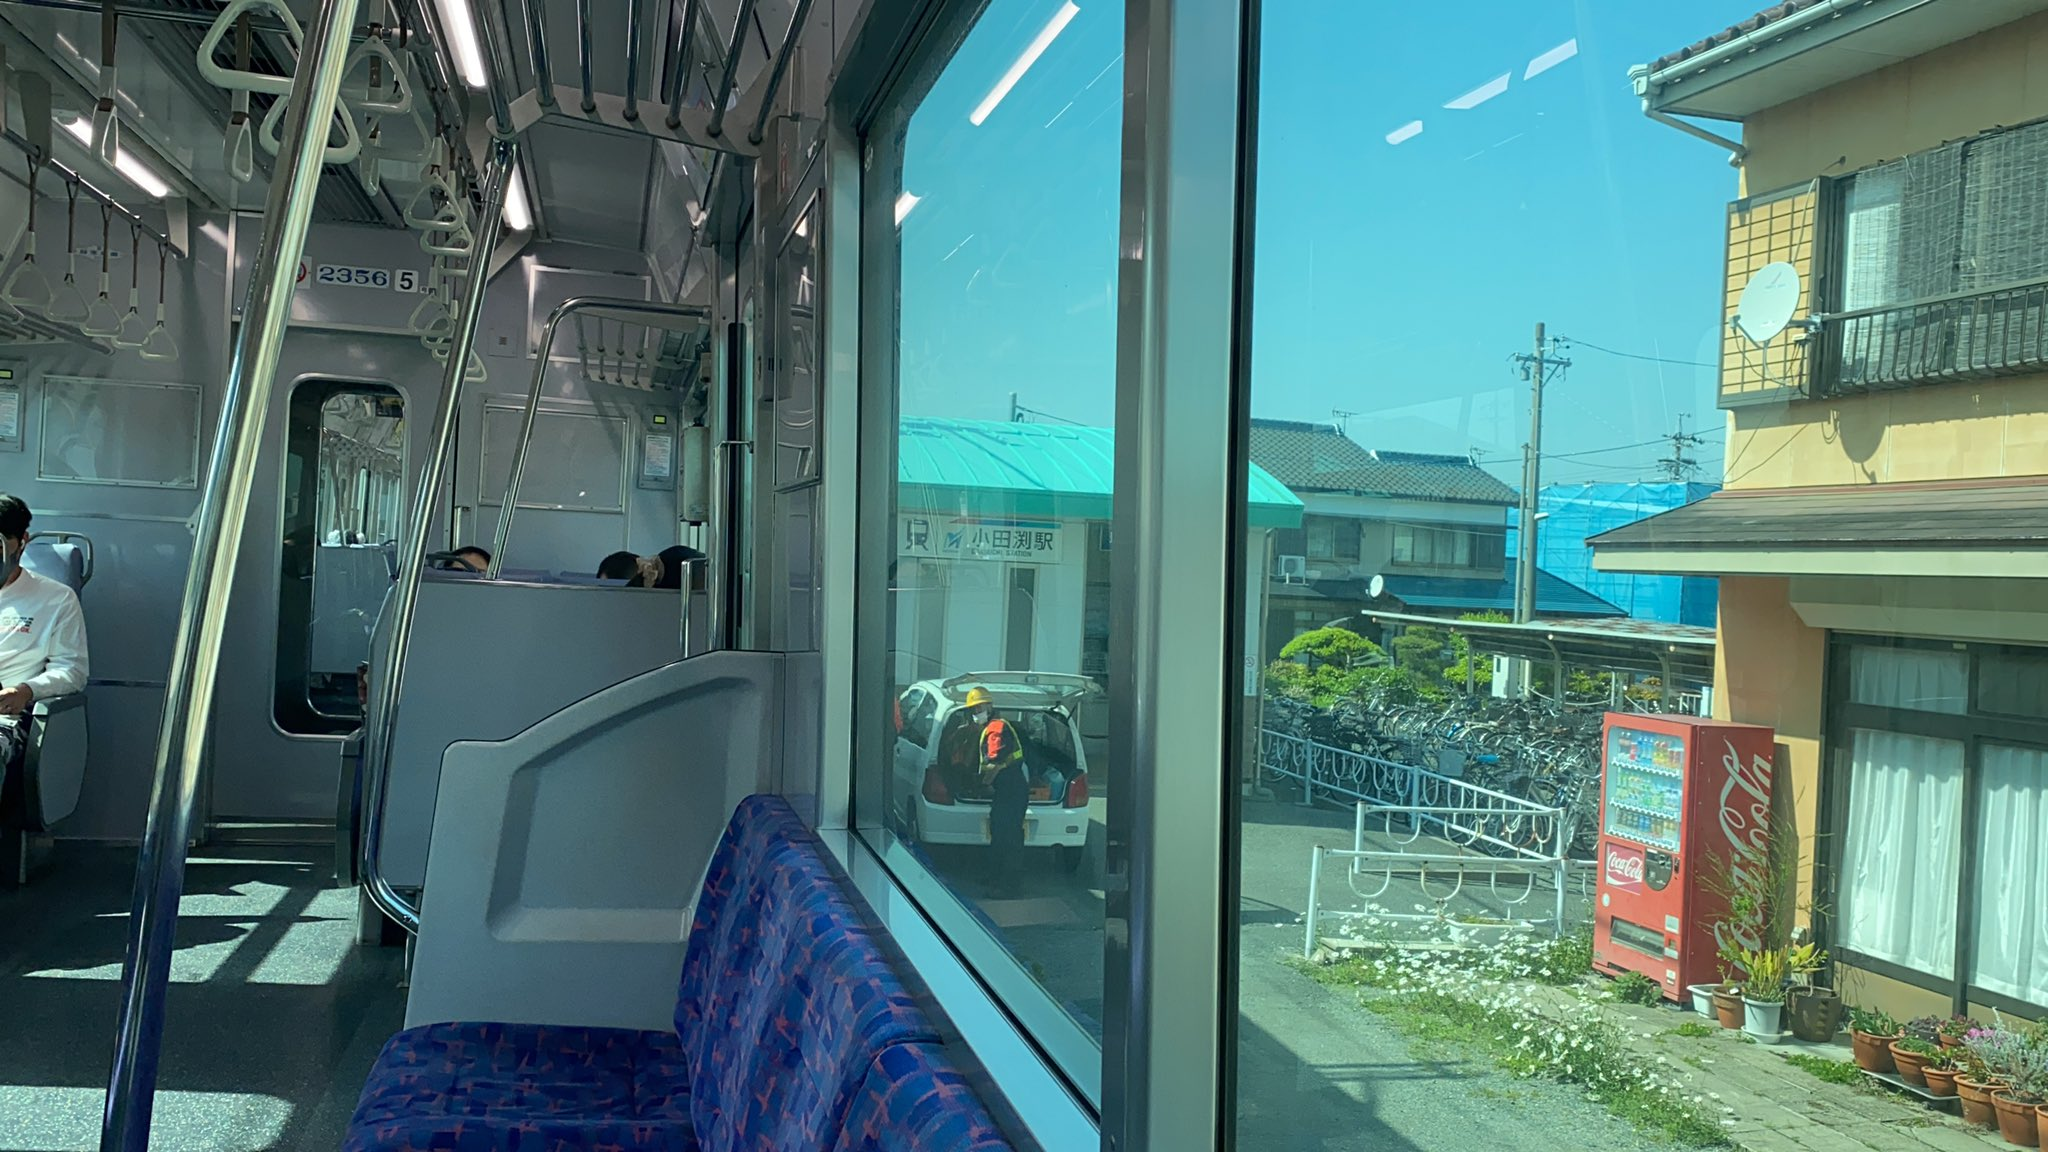 名鉄名古屋本線の小田渕駅付近で人身事故の画像